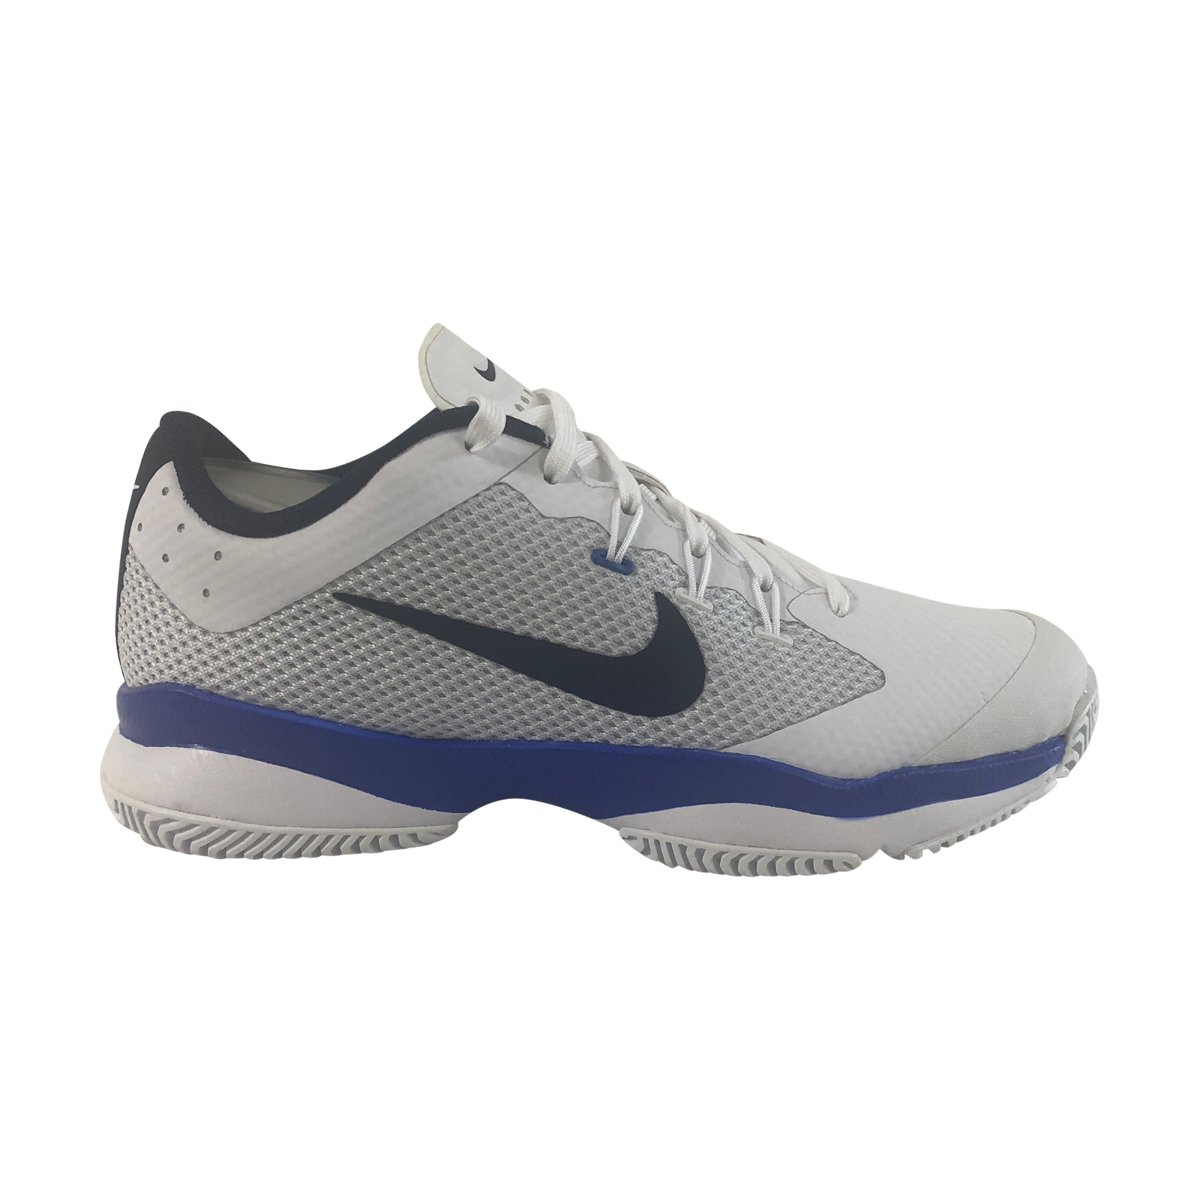 NIKE Women's Air Zoom Ultra Tennis Shoes B01N4GOW46 6 B(M) US|White/Binary Blue-mega Blue